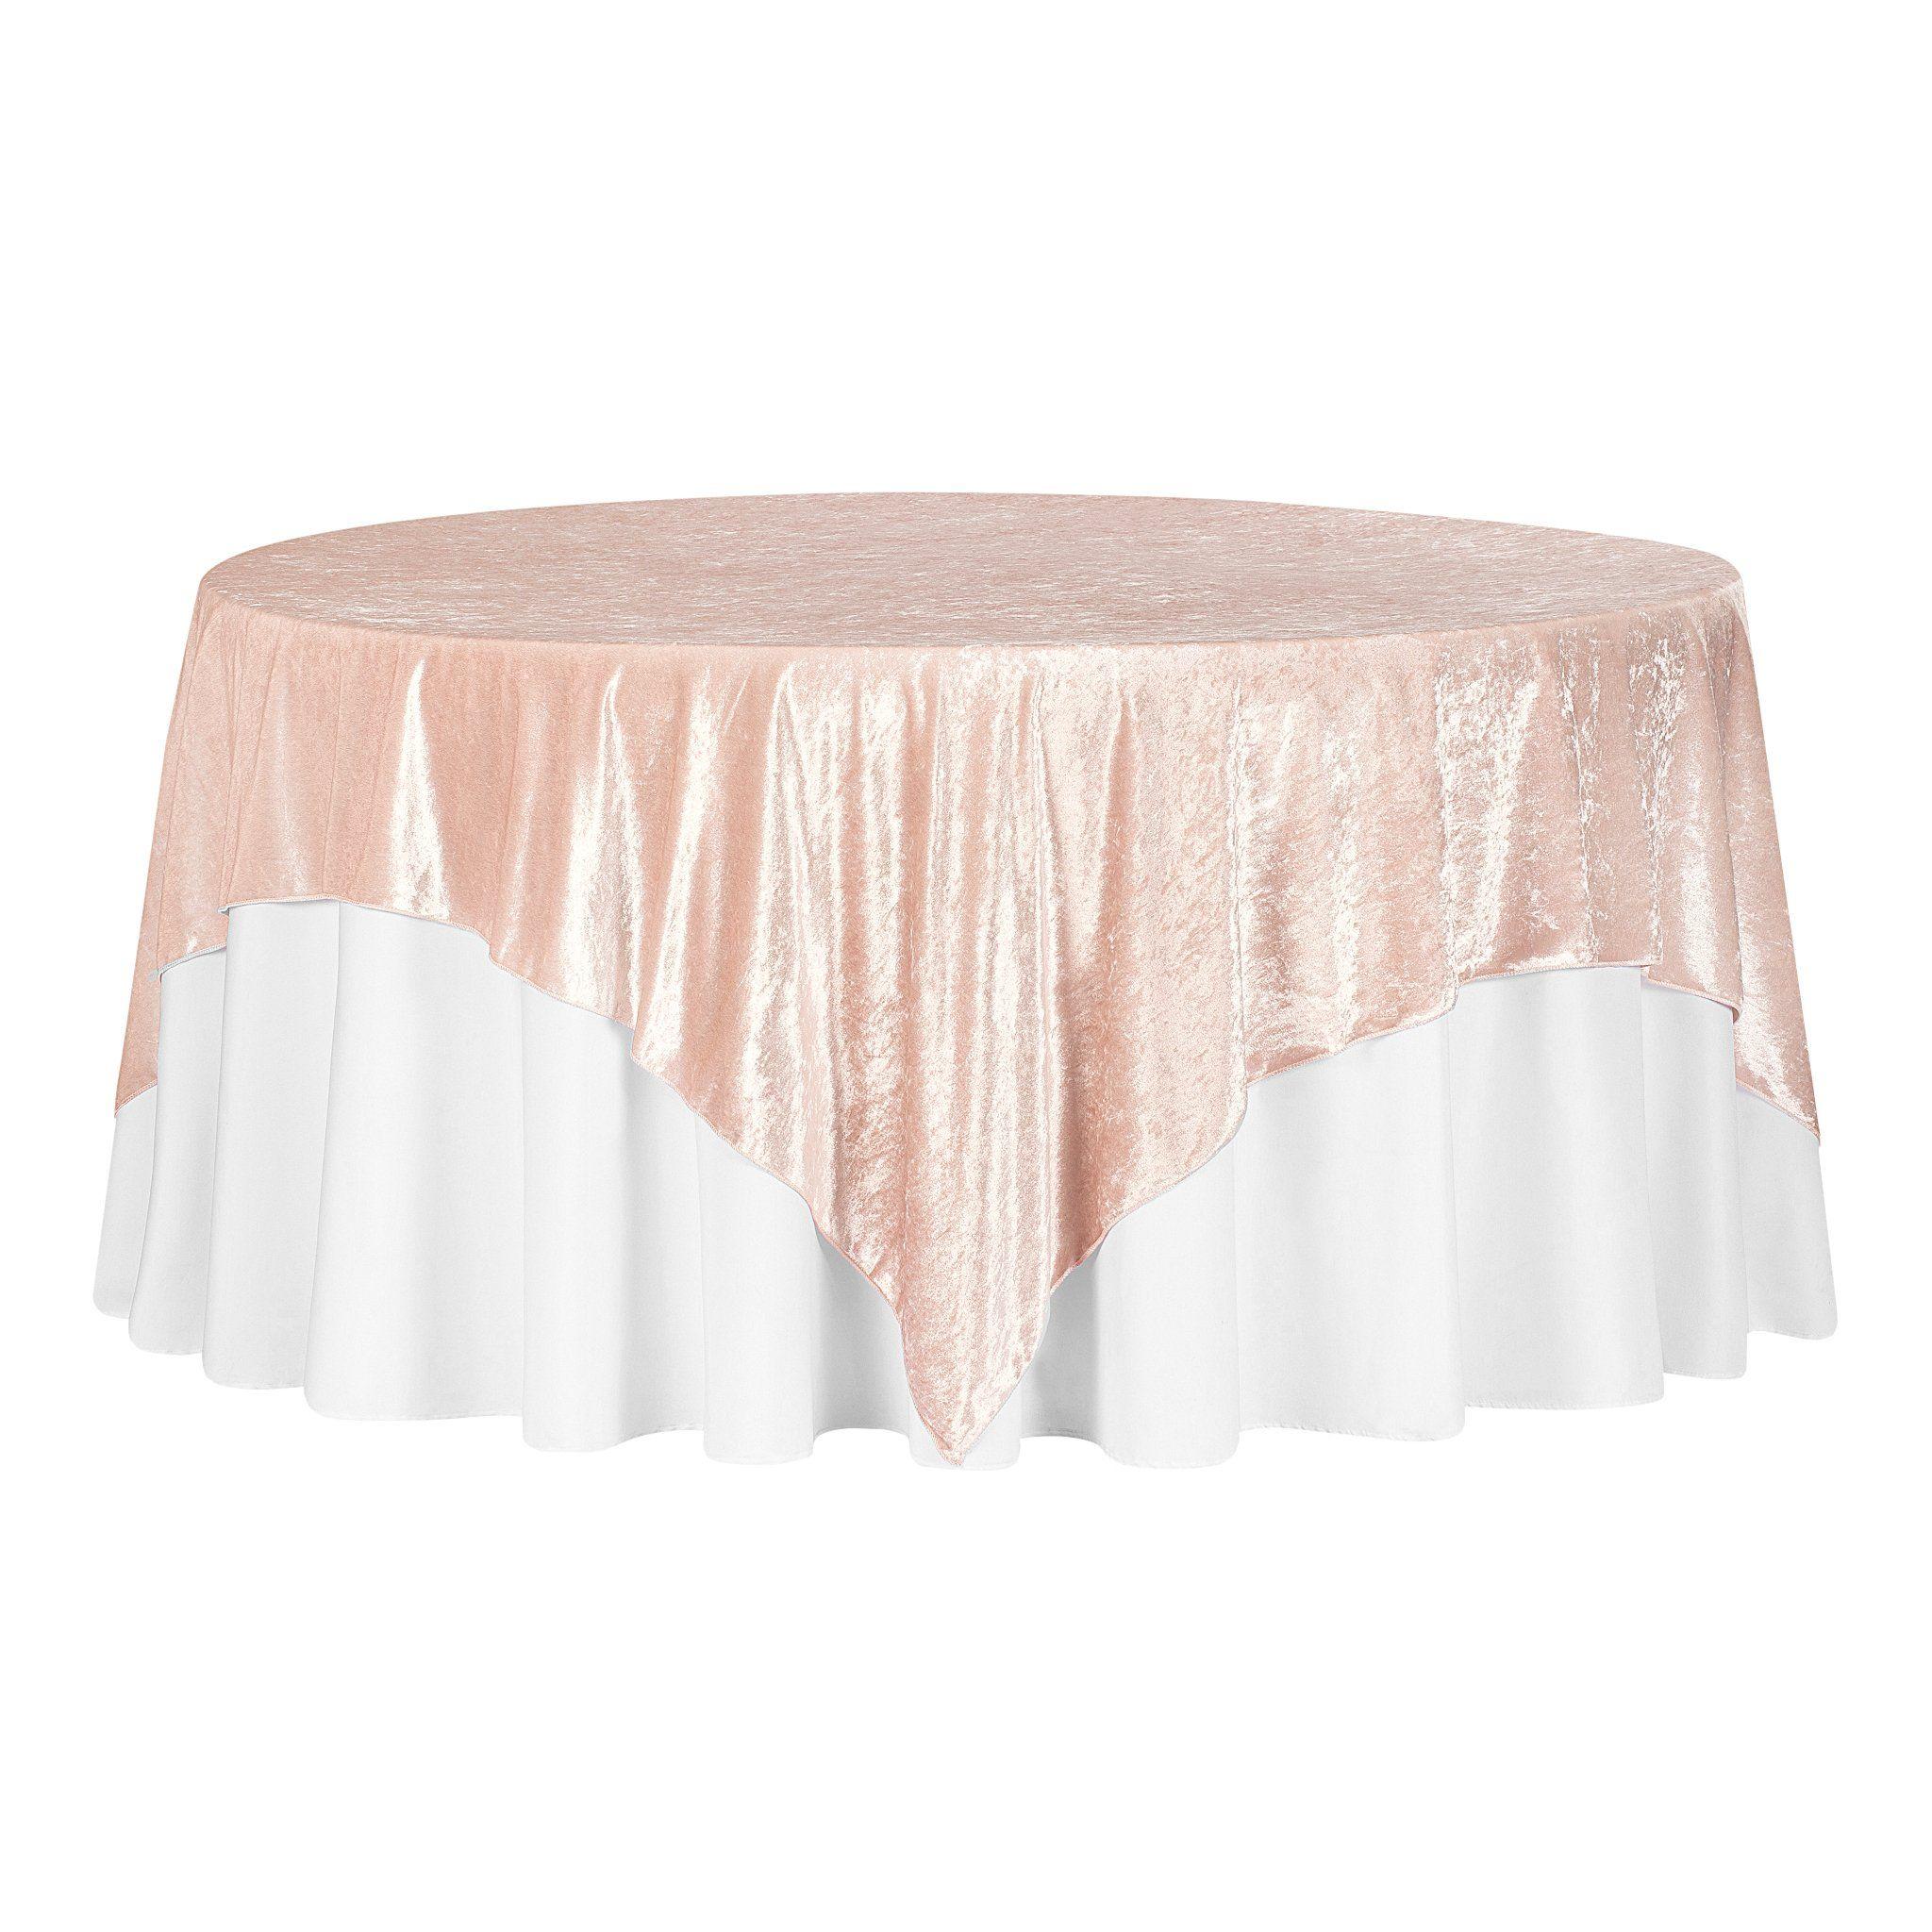 "Velvet 85""x85"" Square Tablecloth Table Overlay - Blush/Rose Gold"